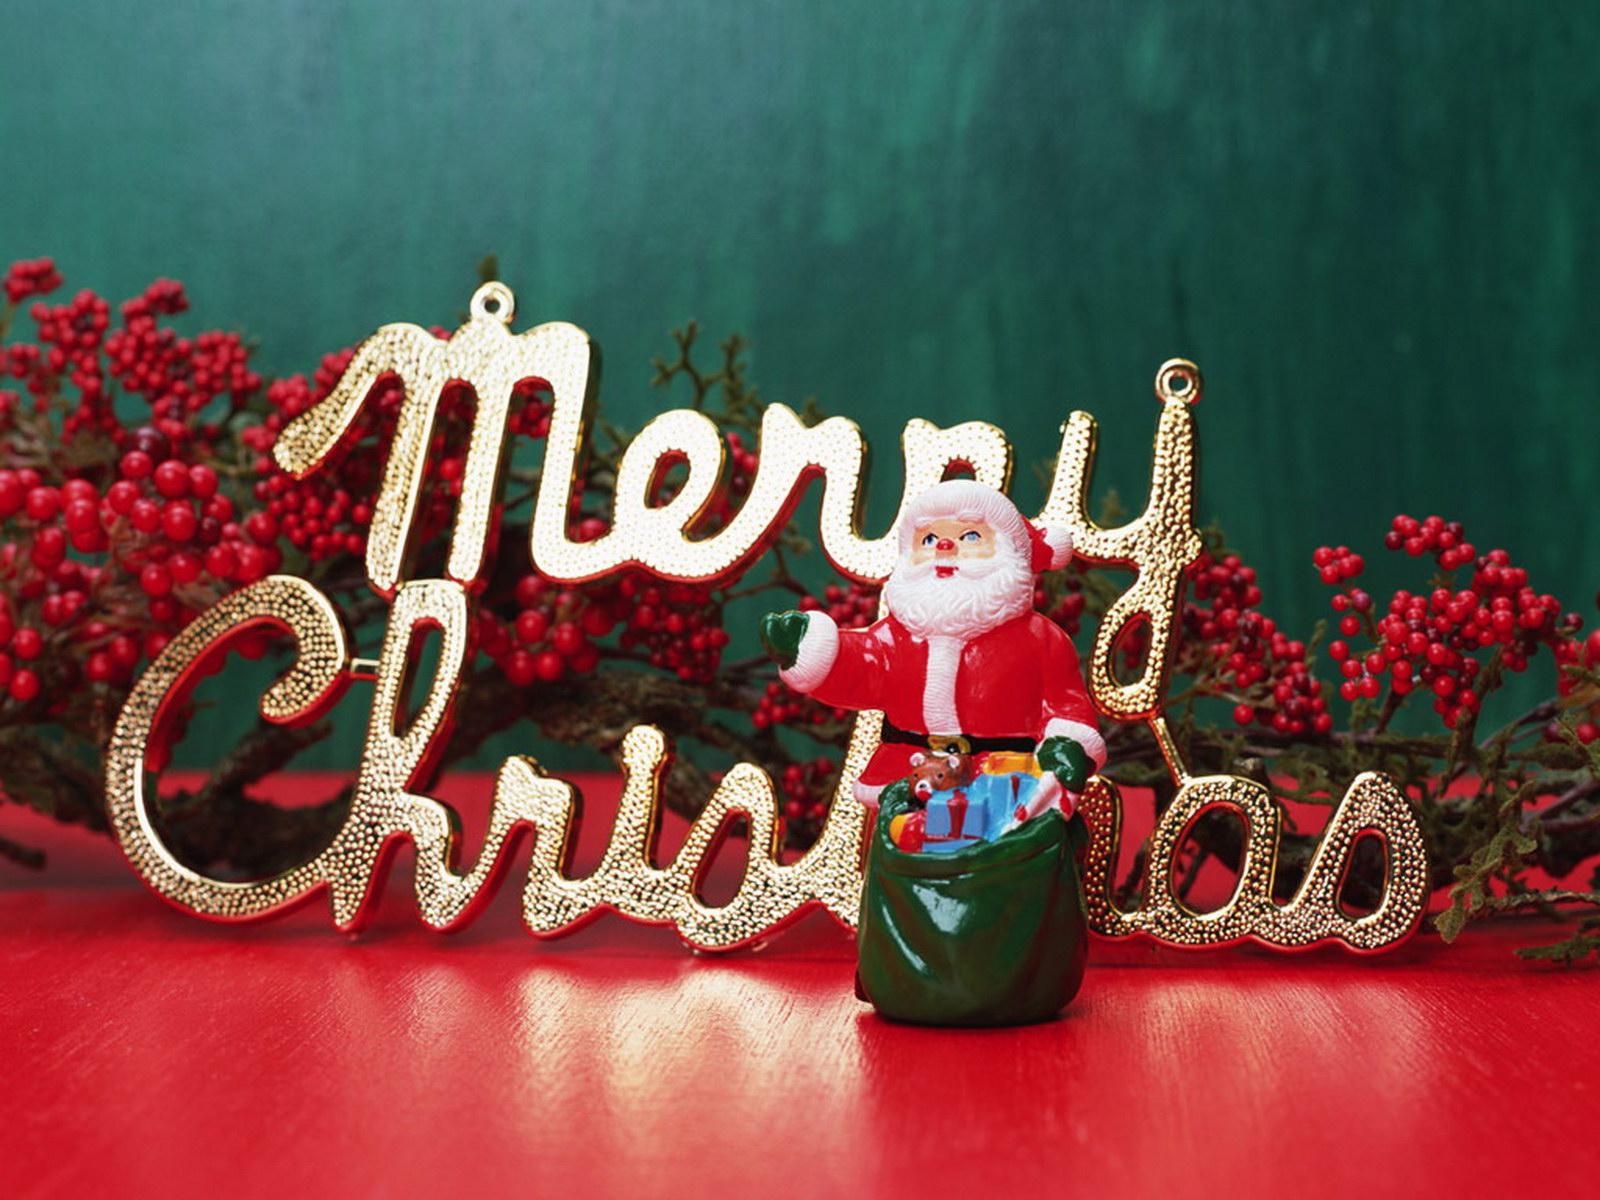 http://1.bp.blogspot.com/_2weMz-0UdEg/SxPLu4ektFI/AAAAAAAAErU/GwS8f5XK7Qw/s1600/Christmas%20Wallpaper%20Poze%20de%20Craciun.jpg